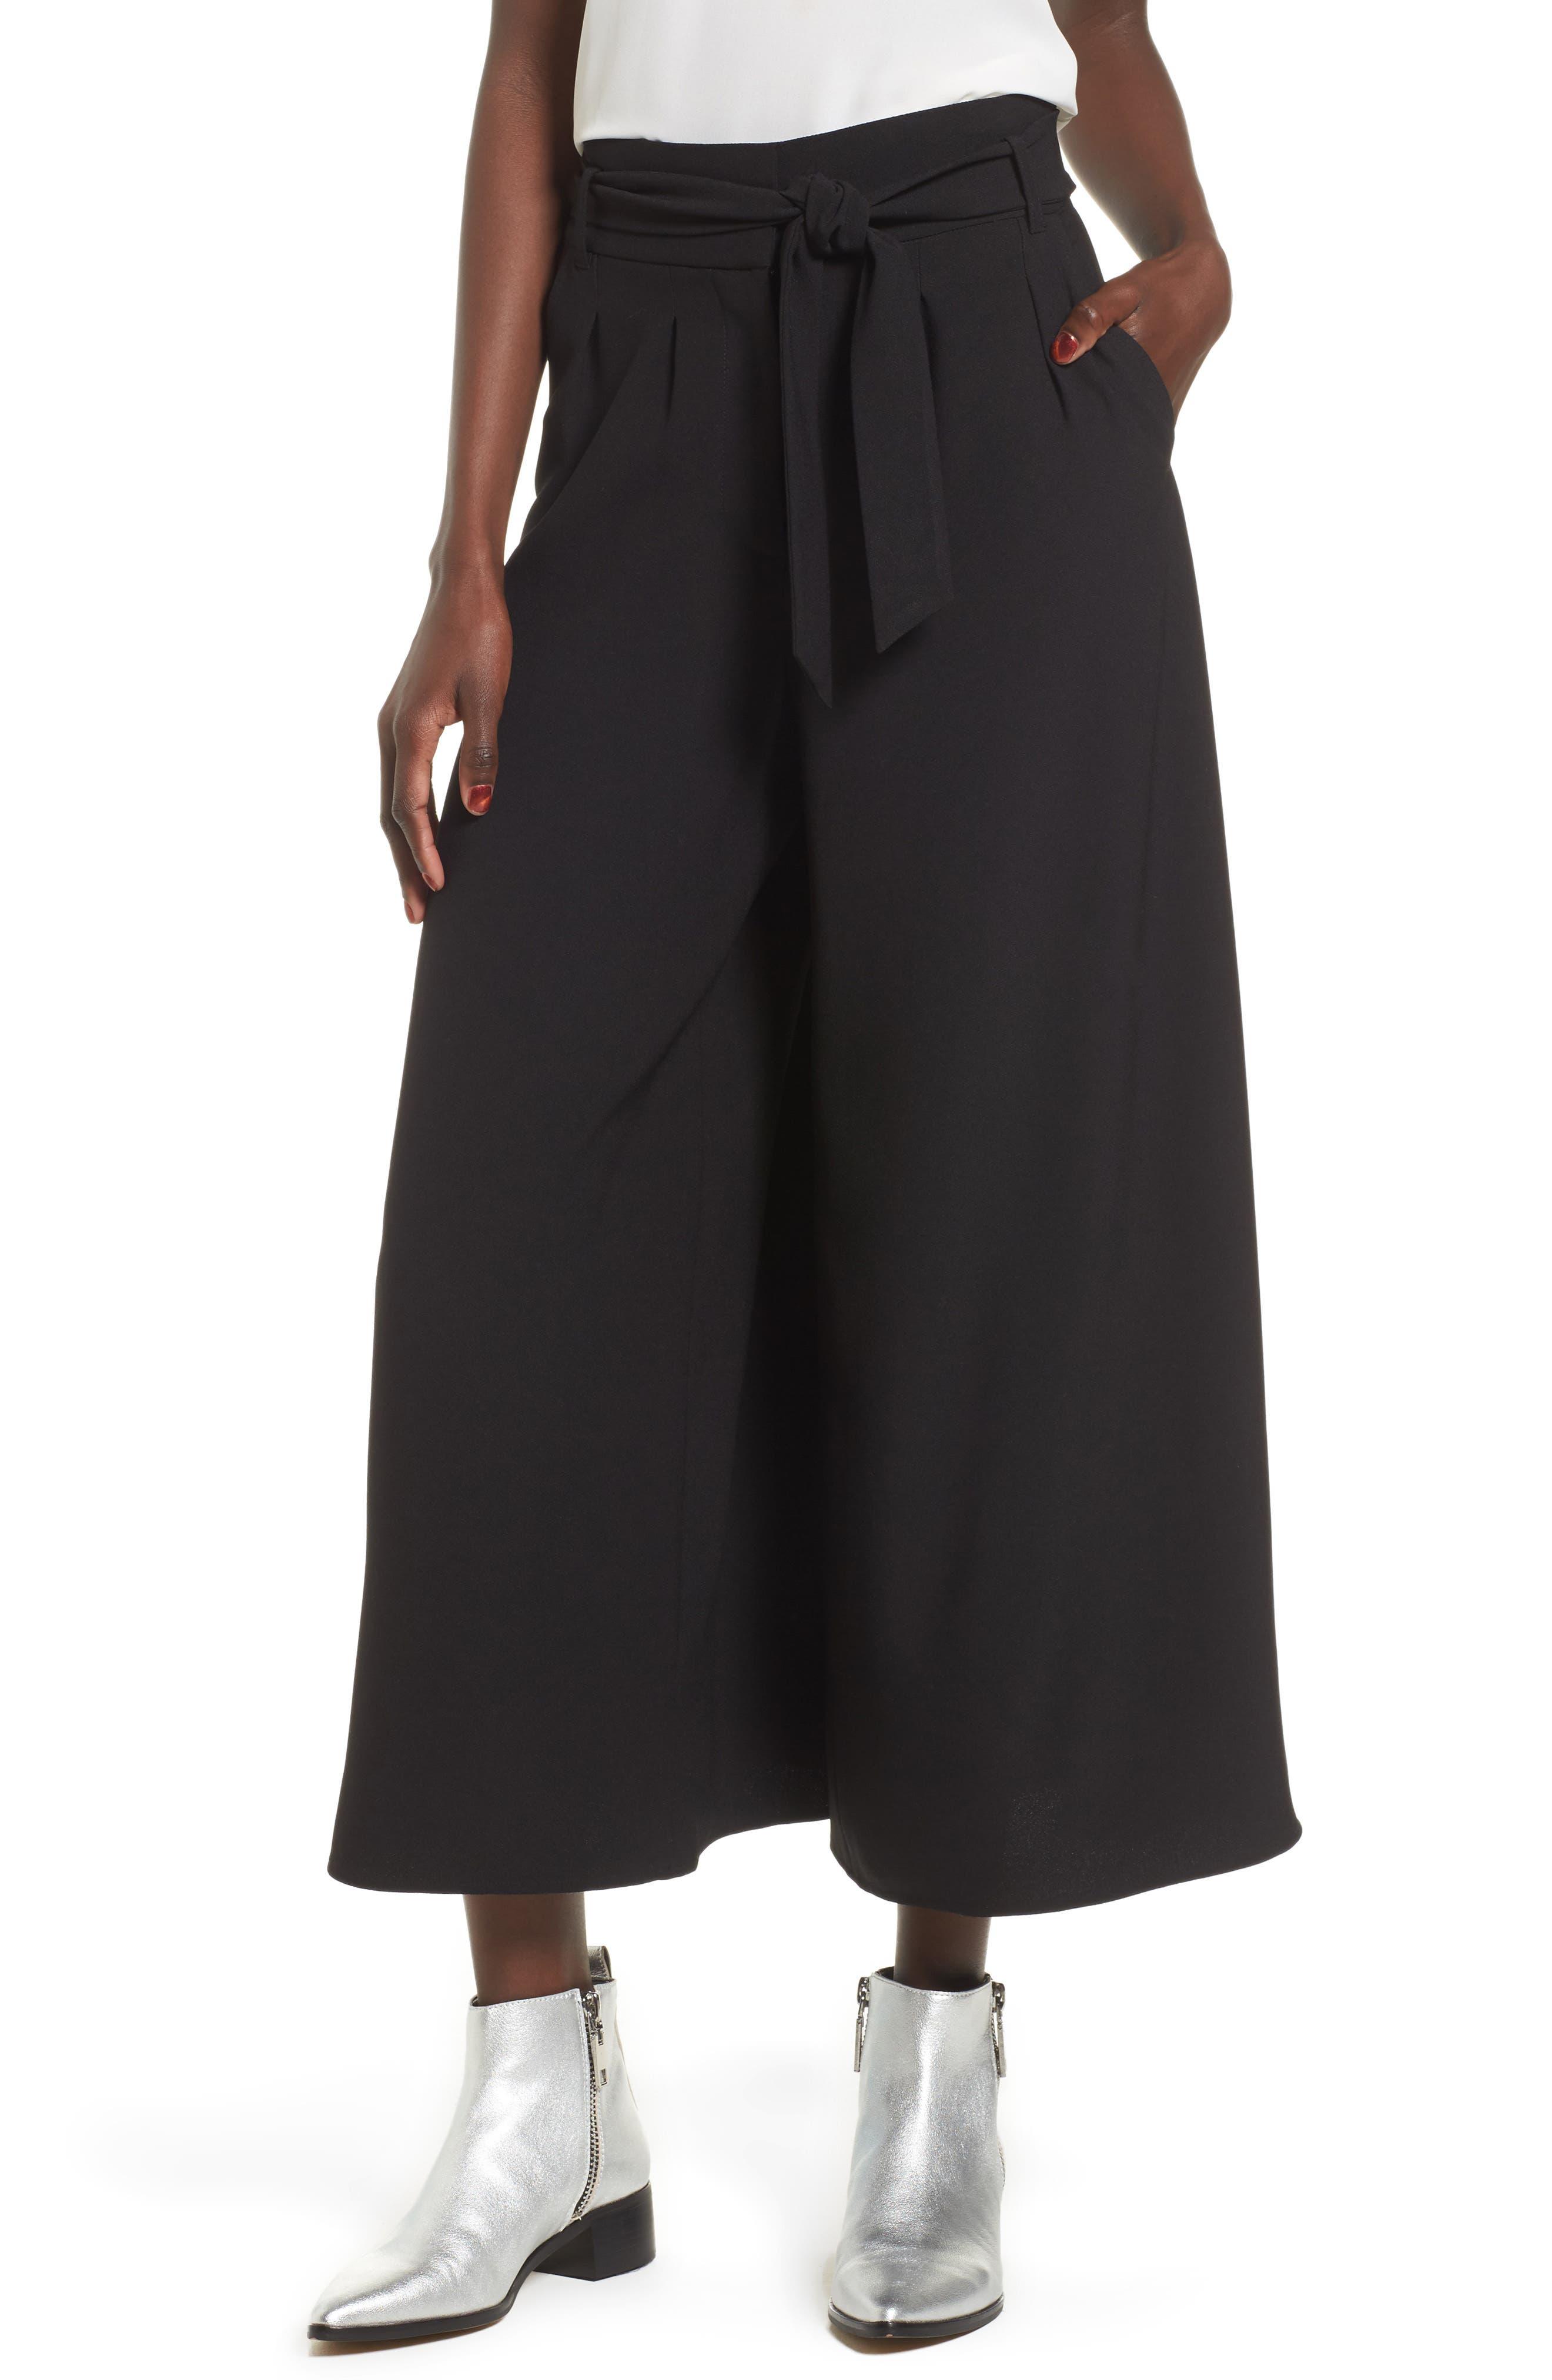 Alternate Image 1 Selected - Leith High Waist Crop Wide Leg Pants